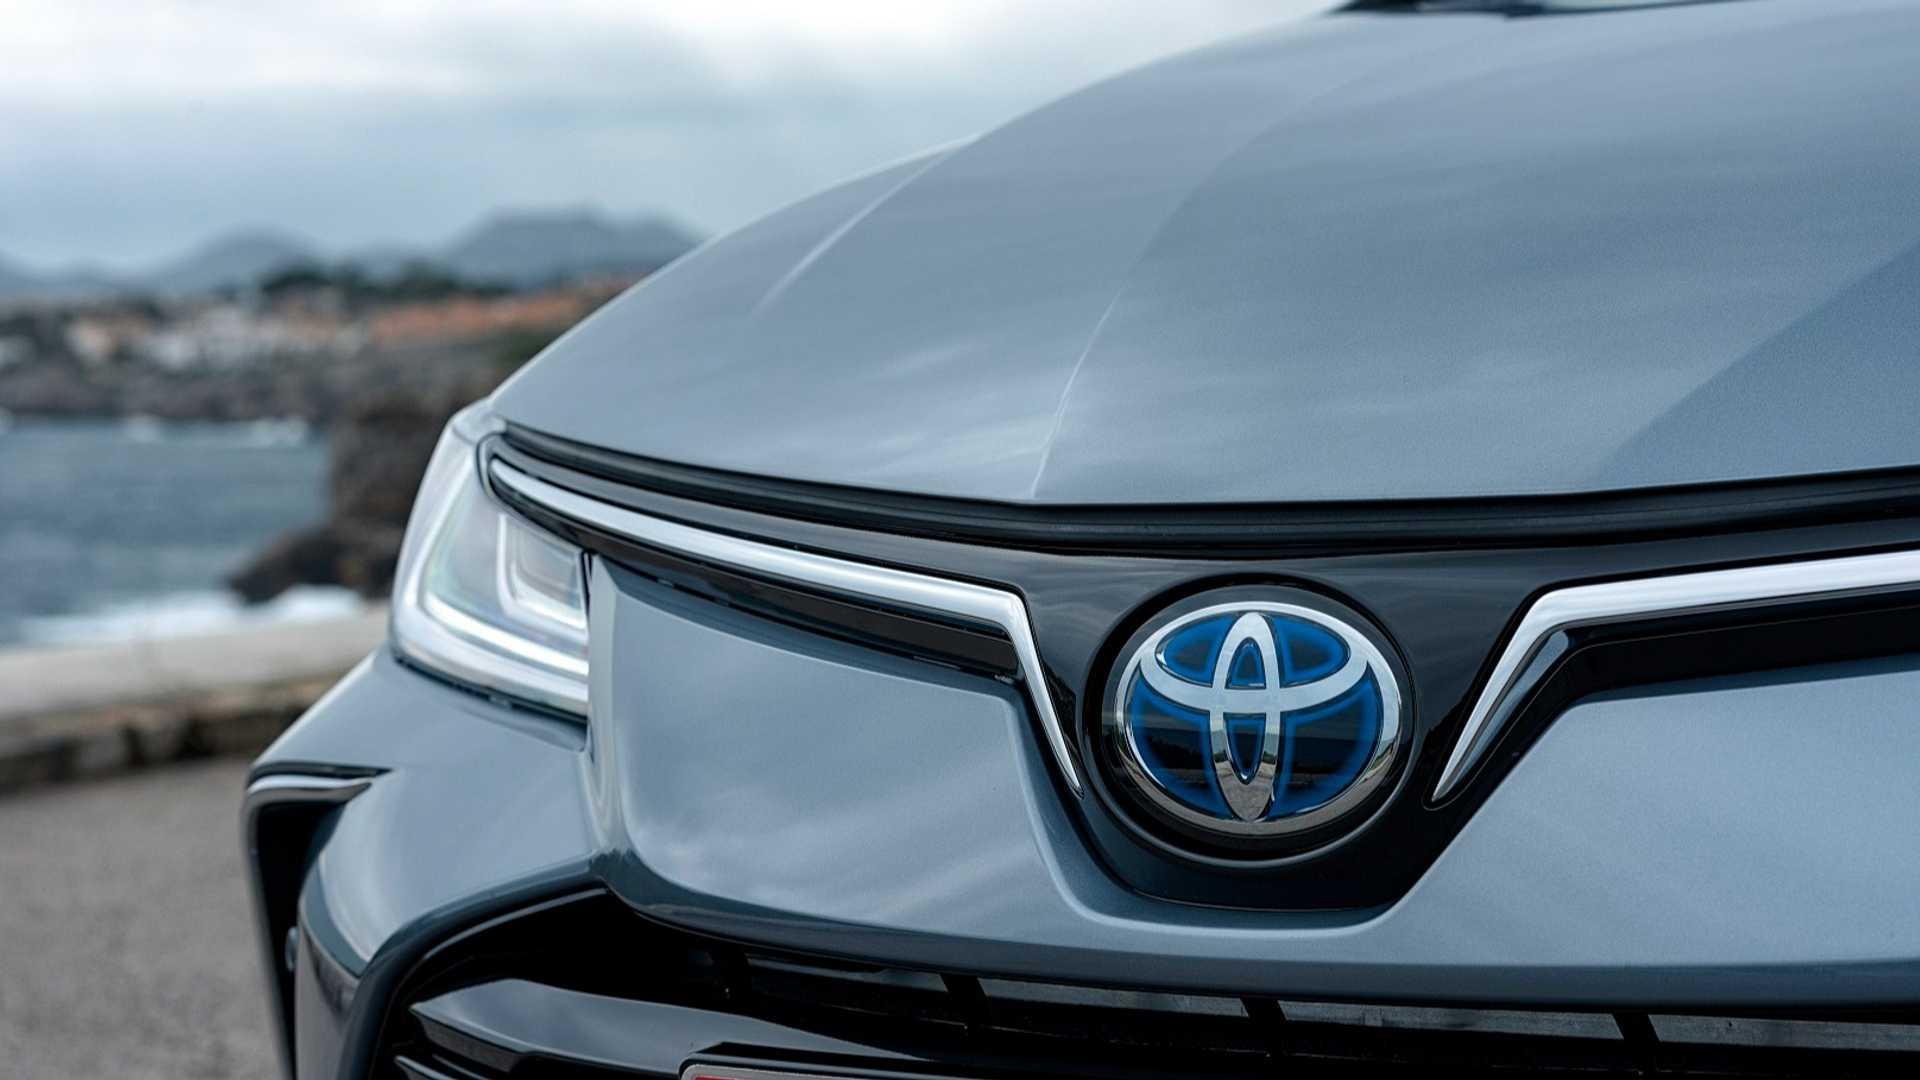 2019-toyota-corolla-hybrid-sedan (7)